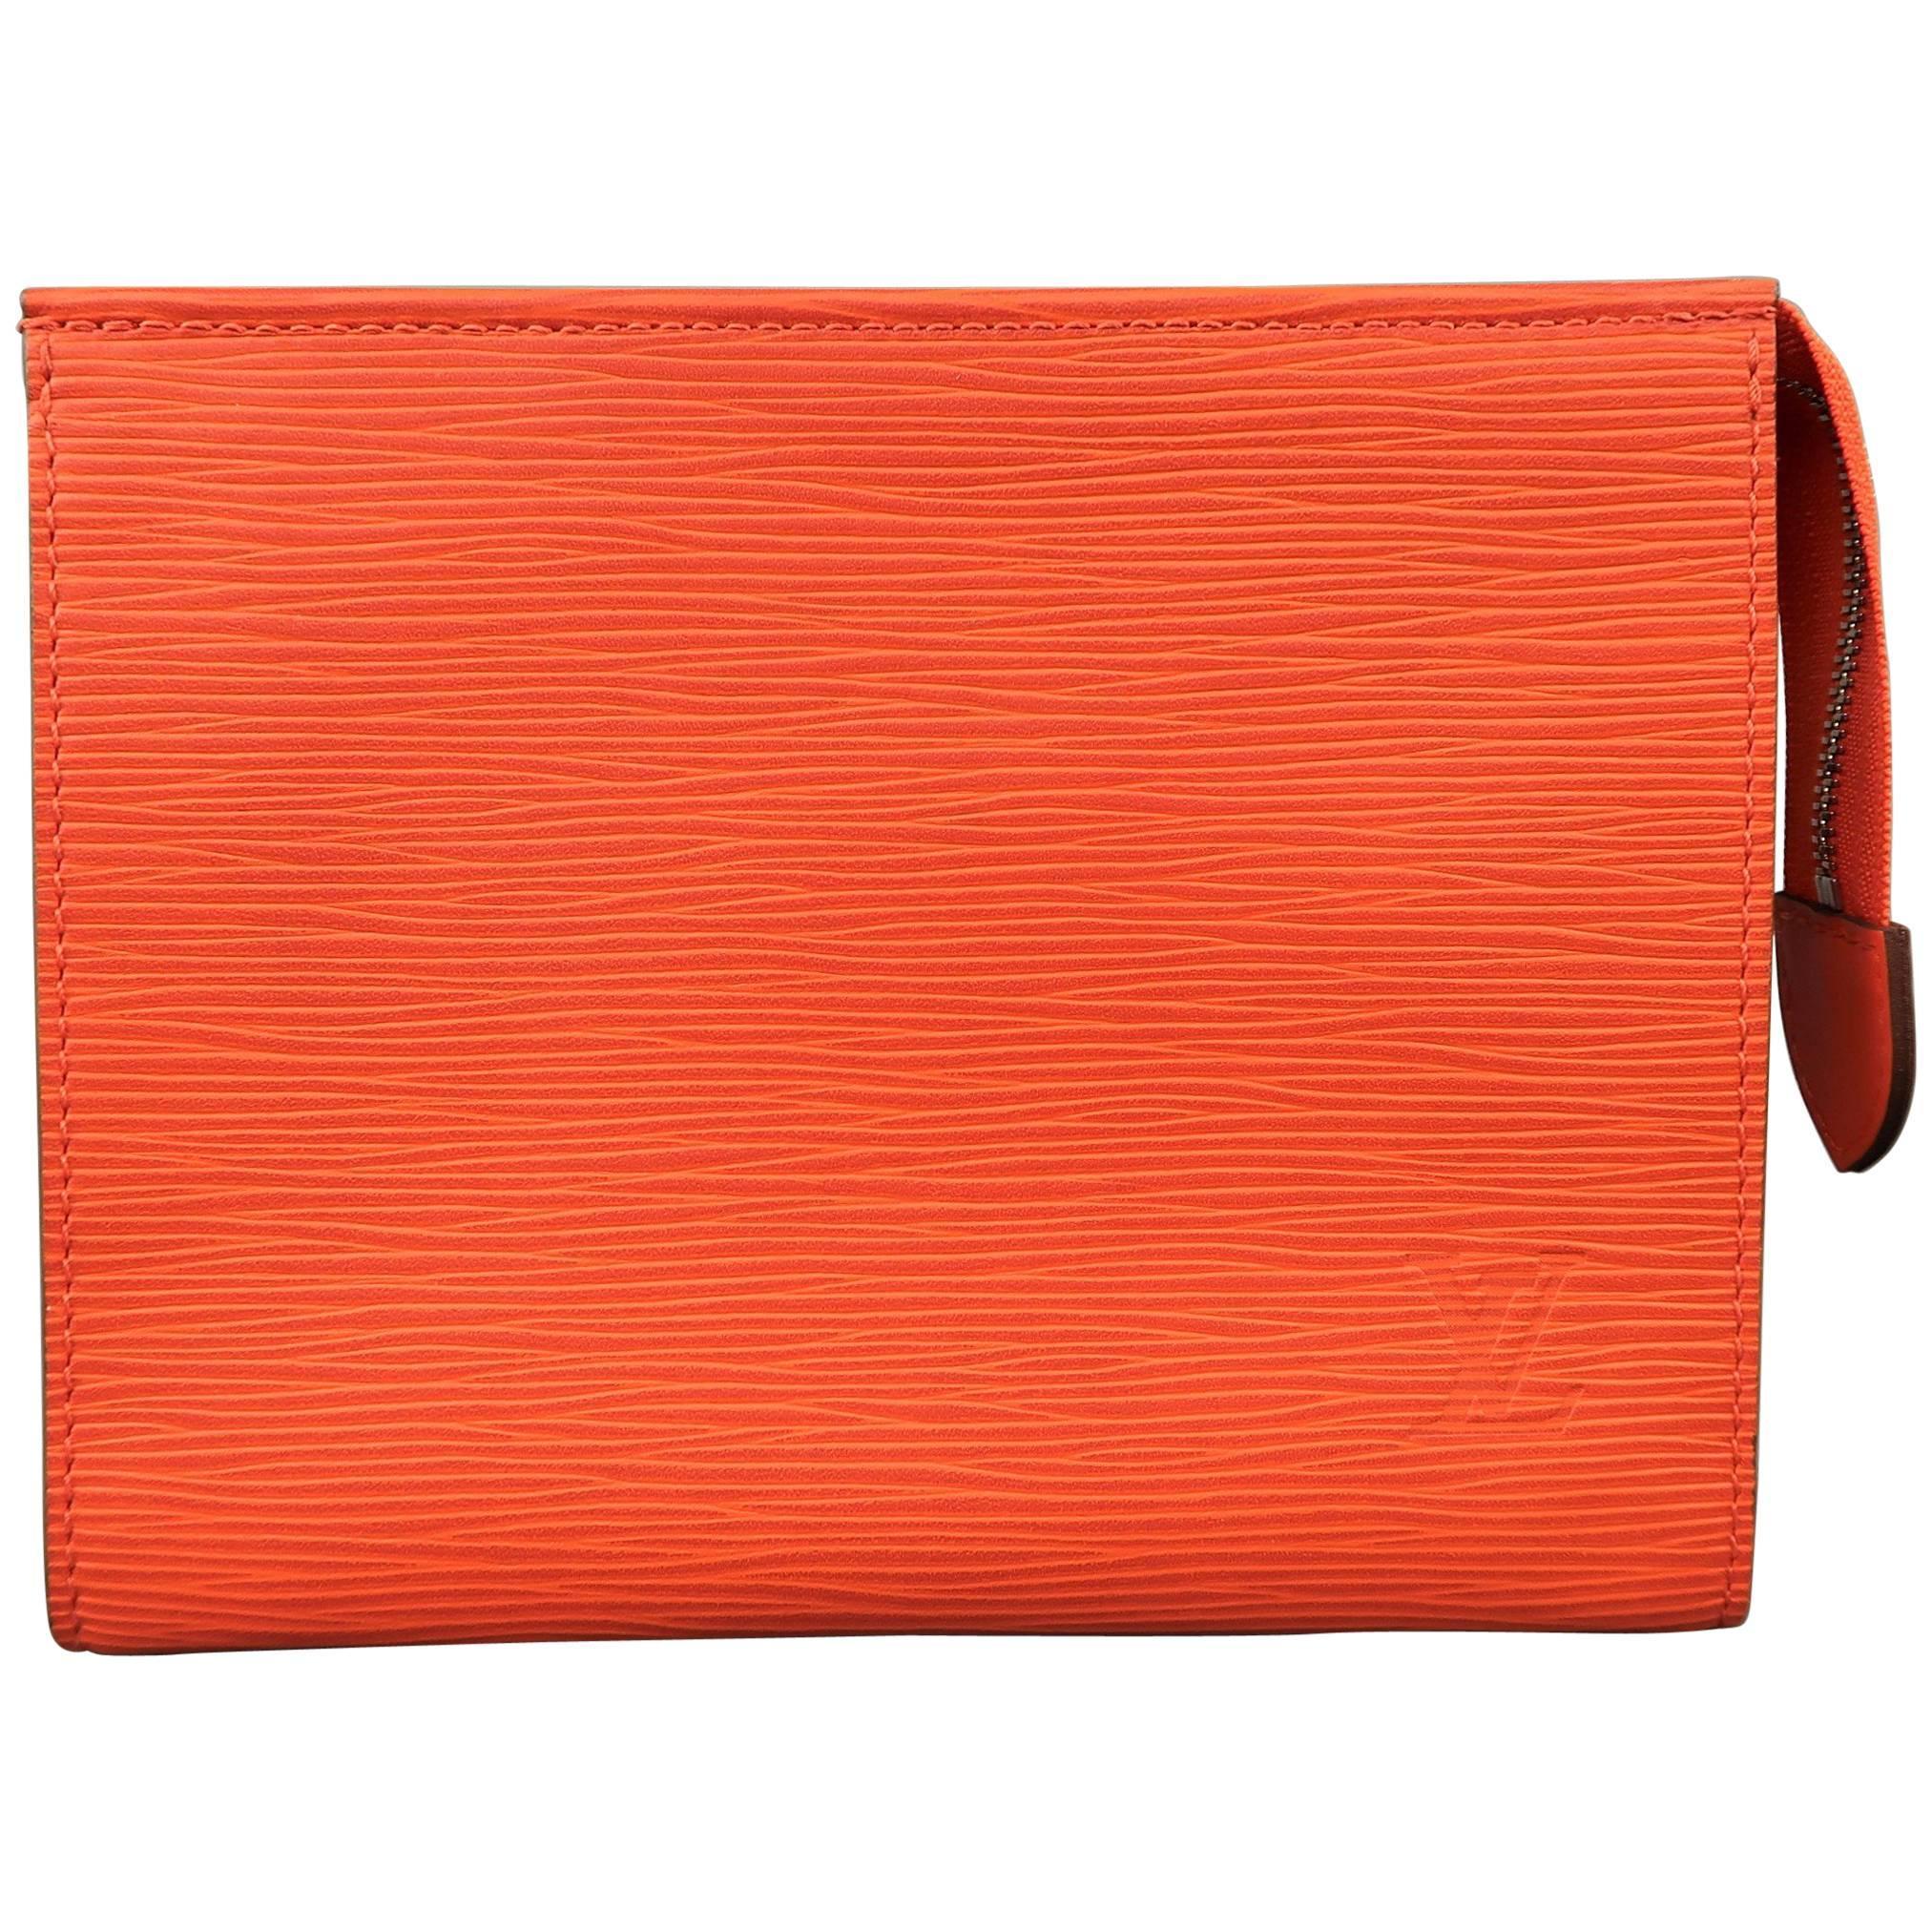 27e99a2e8b8e Louis vuitton bag orange epi leather poche toilette zip pouch bag for sale  jpg 768x768 Pouch